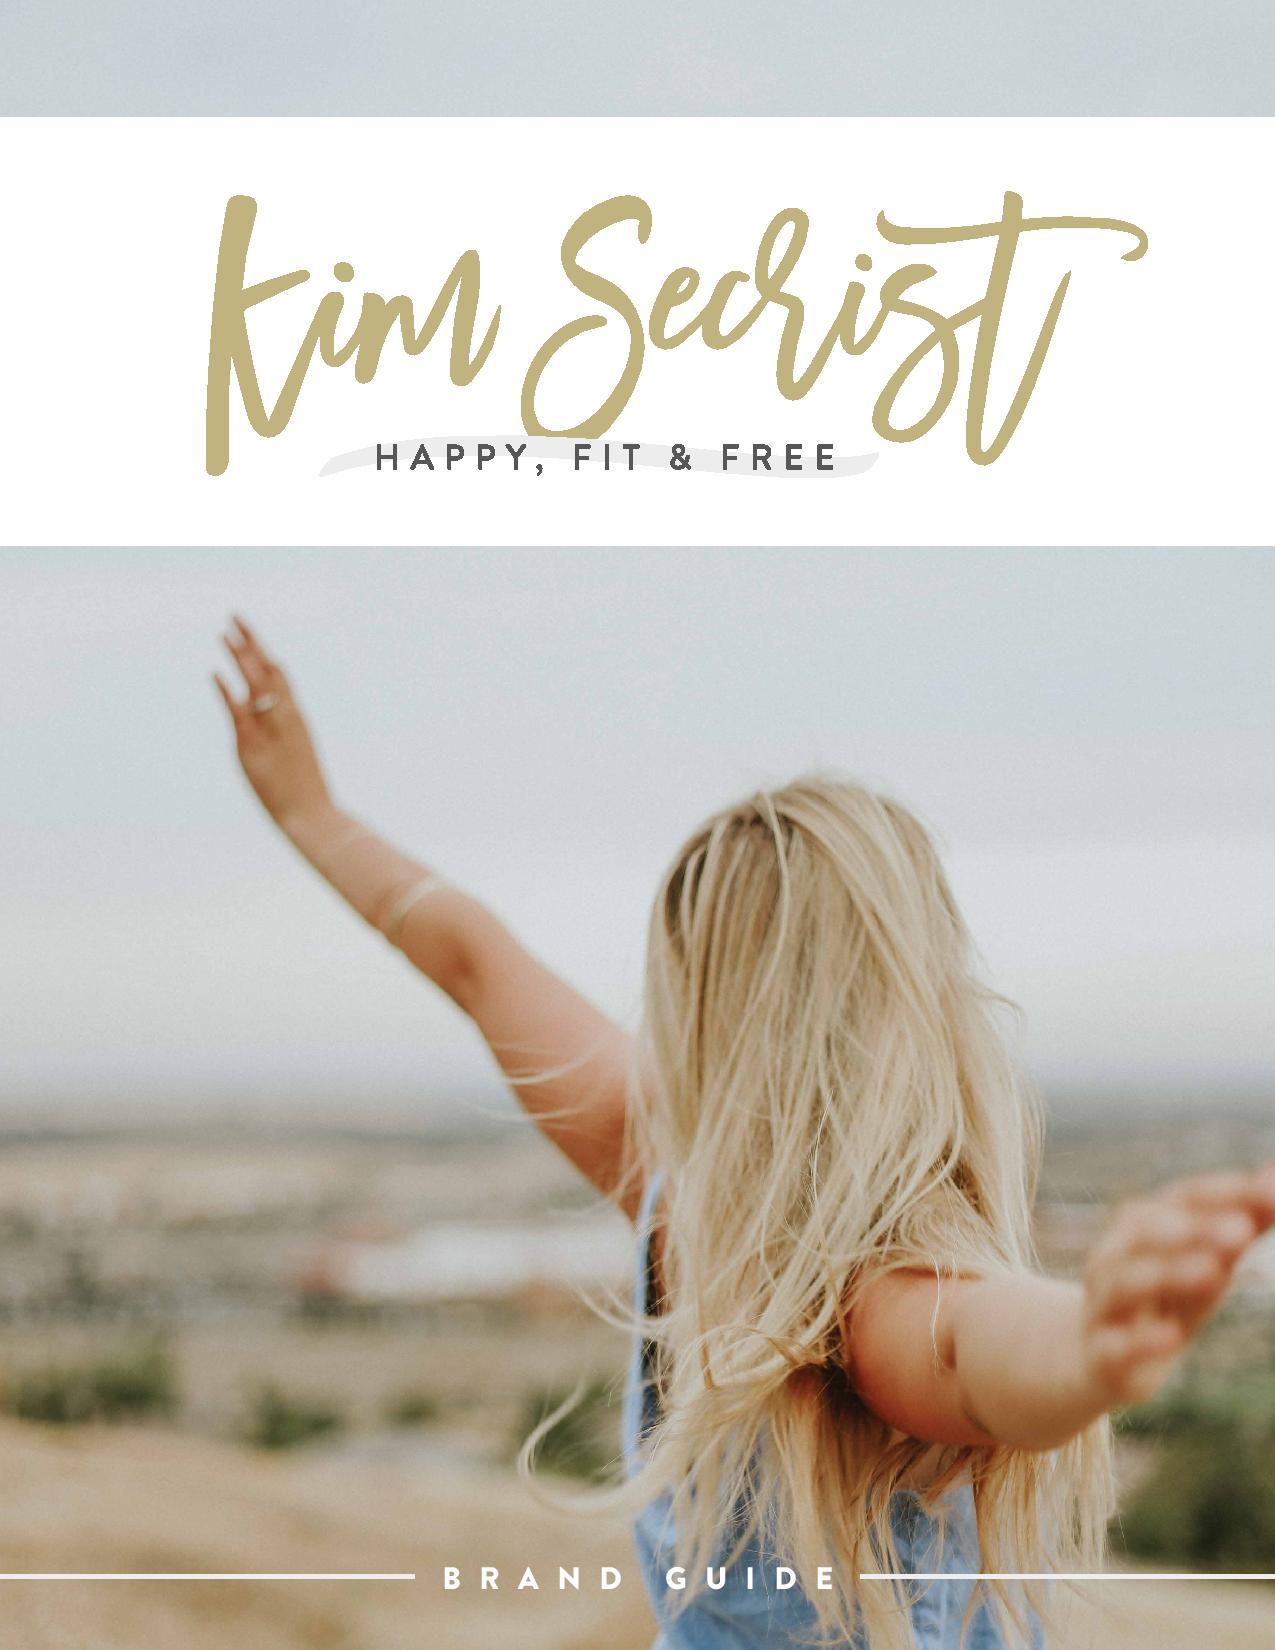 Kim Secrist Brand Guide-page-001.jpg